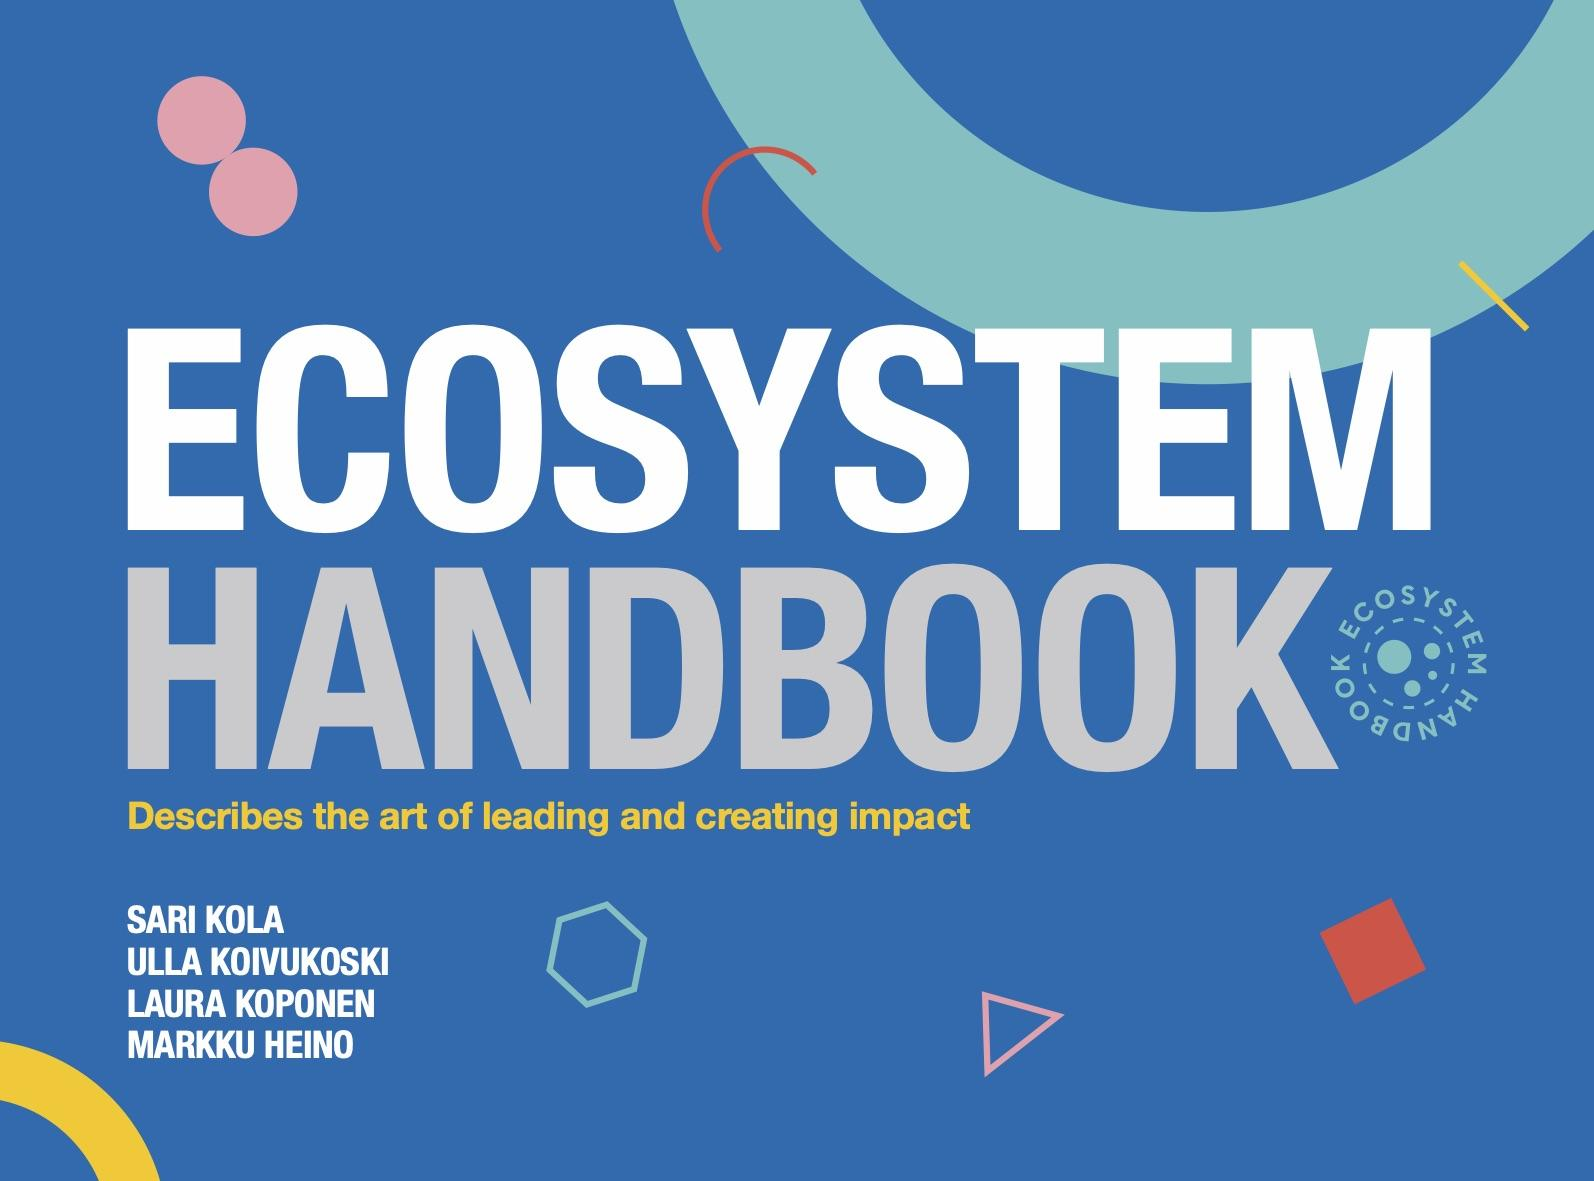 Ecosystem Handbook: Why read it?